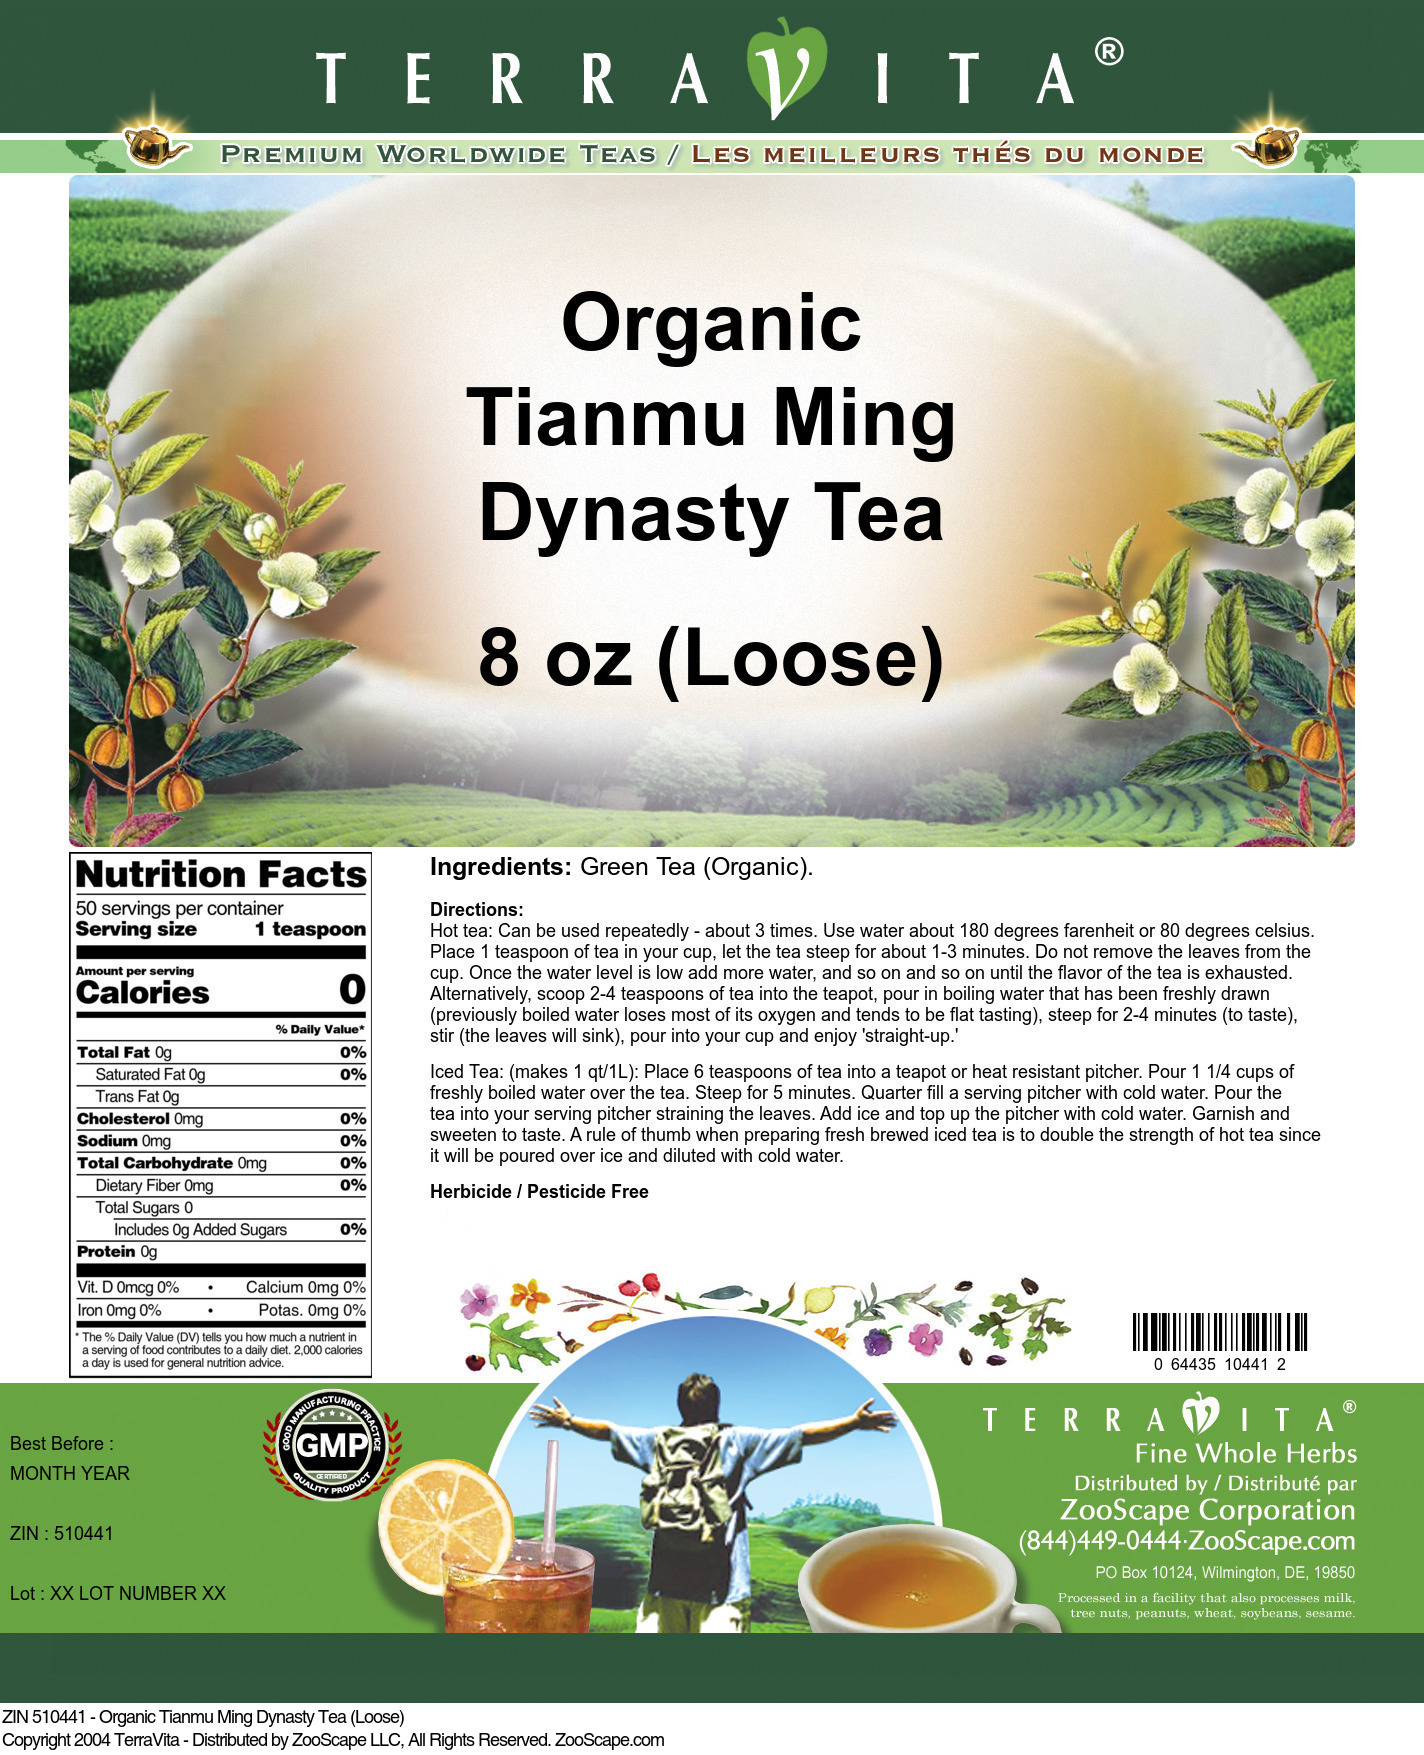 Organic Tianmu Ming Dynasty